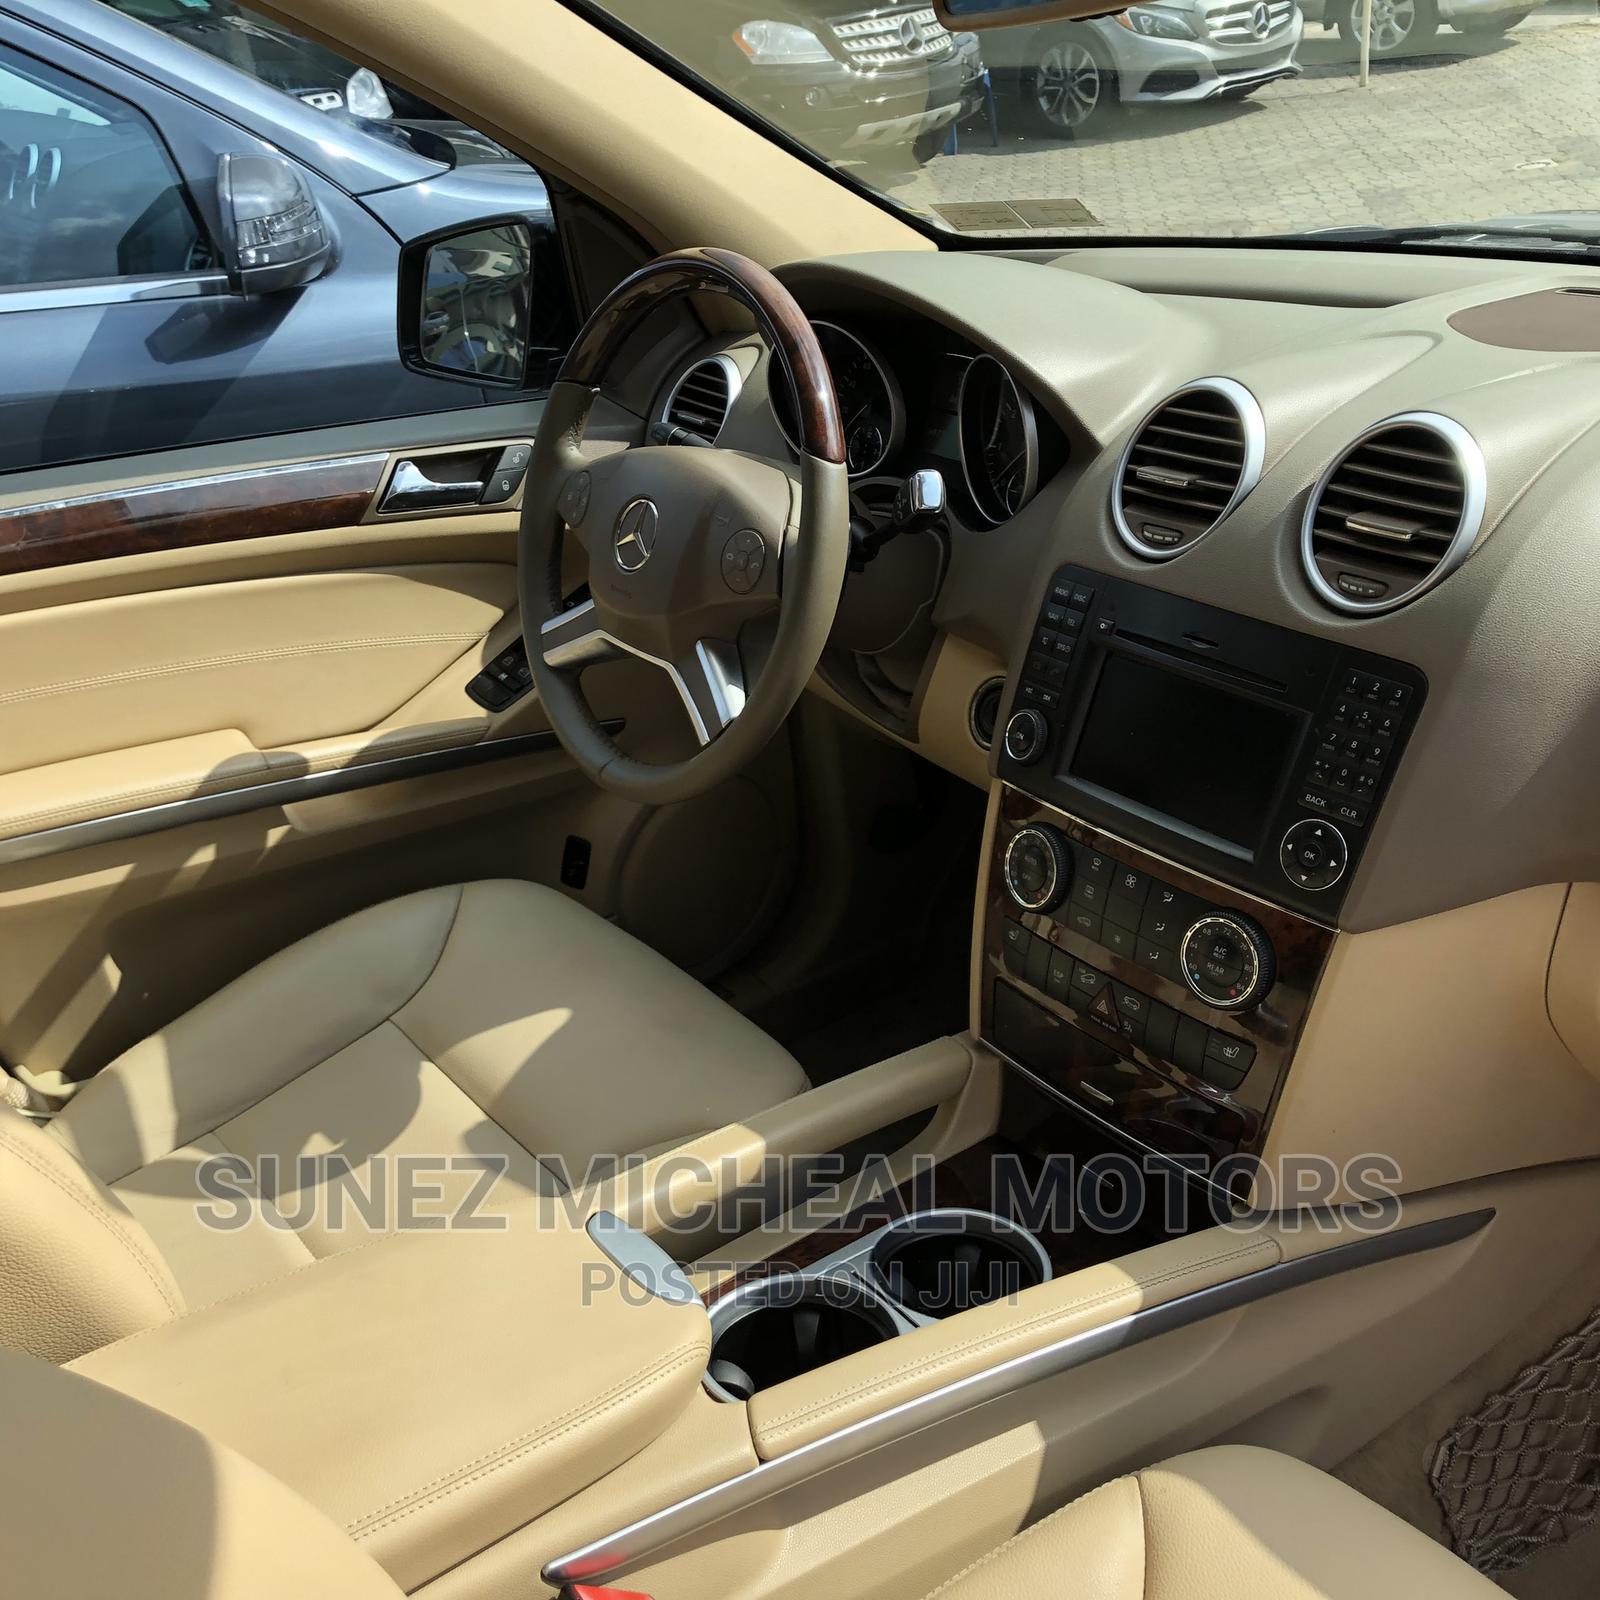 Mercedes-Benz M Class 2011 ML 350 4Matic Black | Cars for sale in Amuwo-Odofin, Lagos State, Nigeria